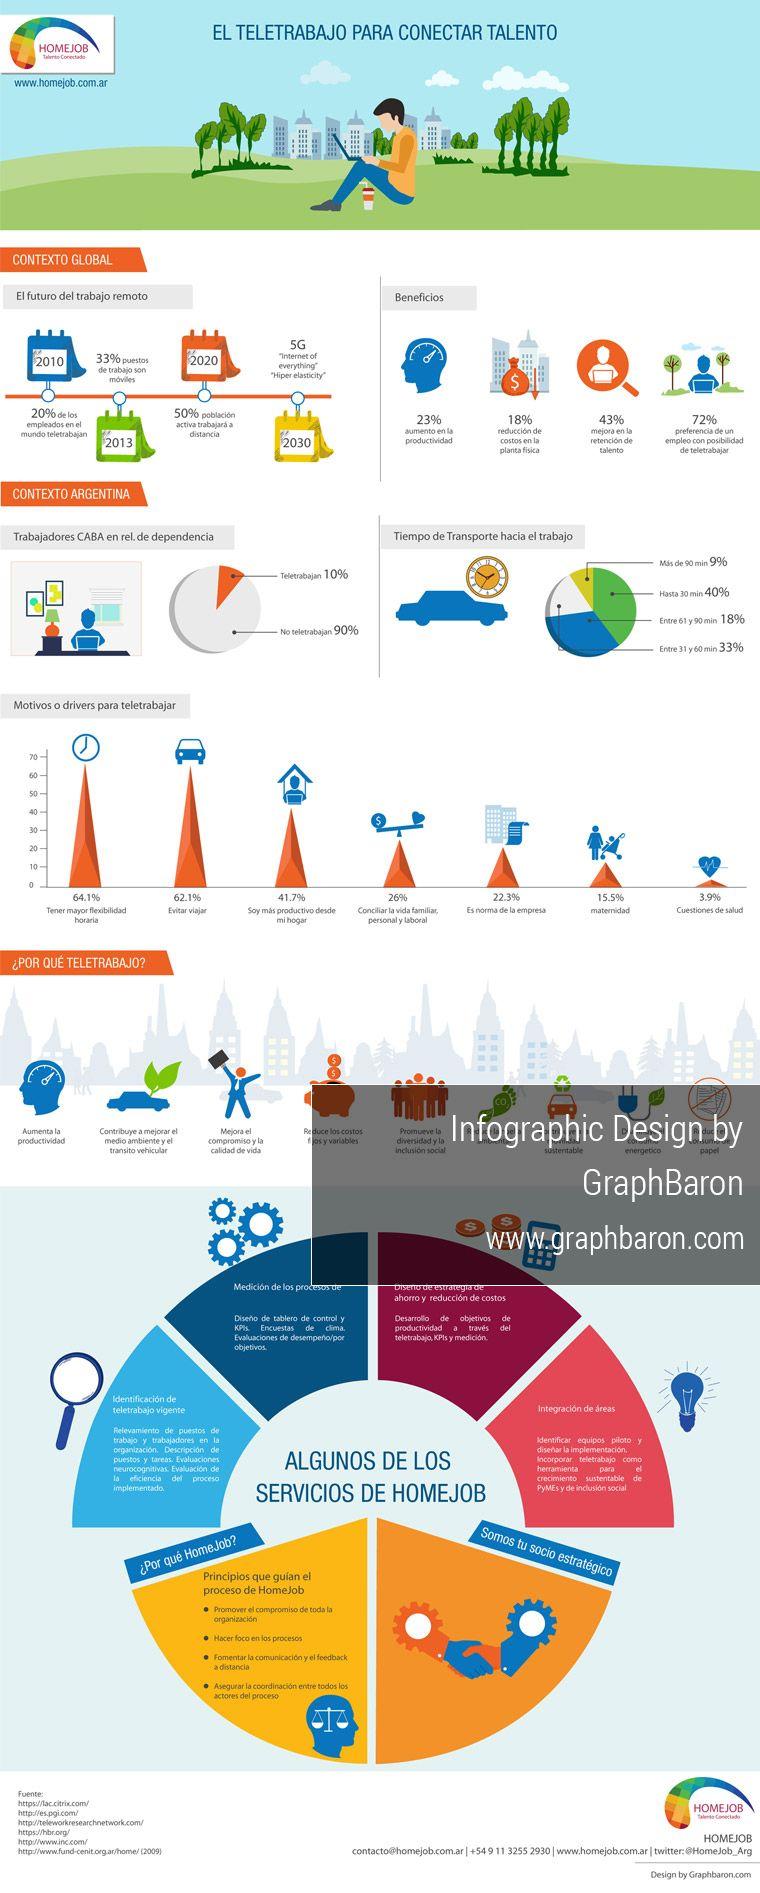 Custom Infographic Design by Graphbaron Home jobs Info